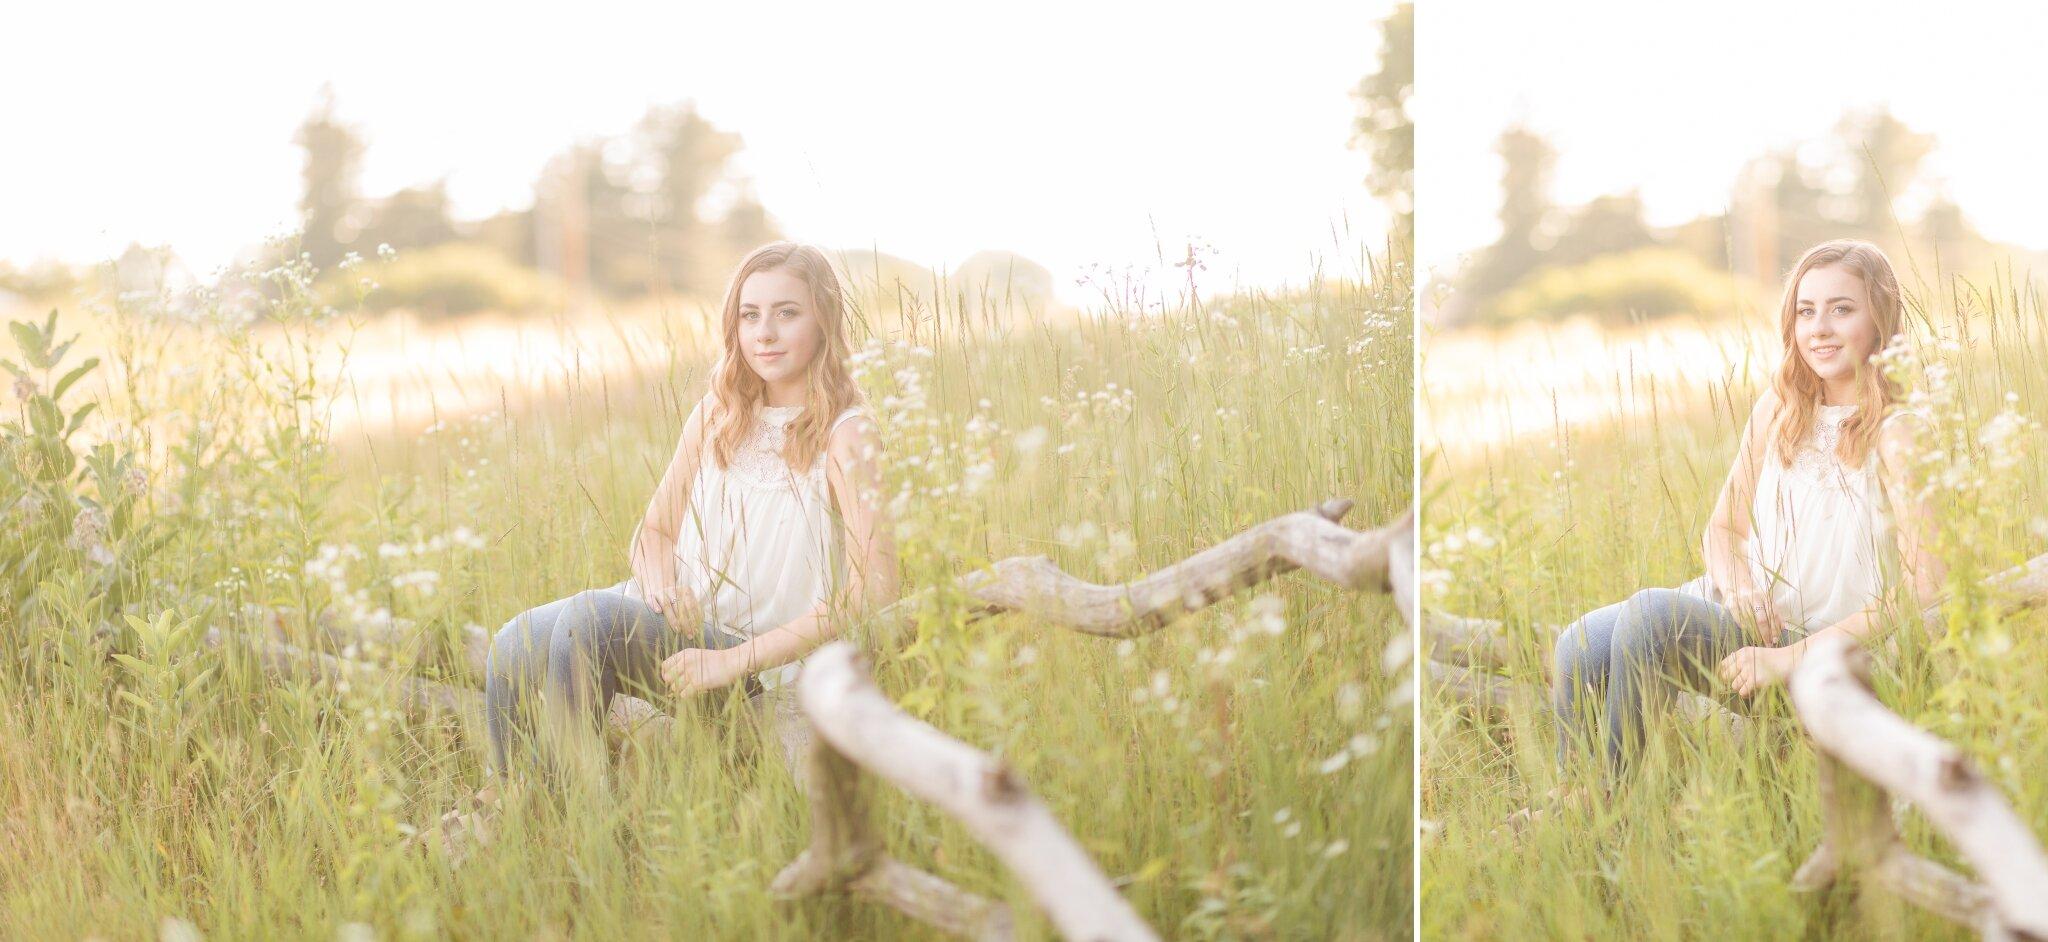 Appleton, WI Senior Girl Photos on Driftwood